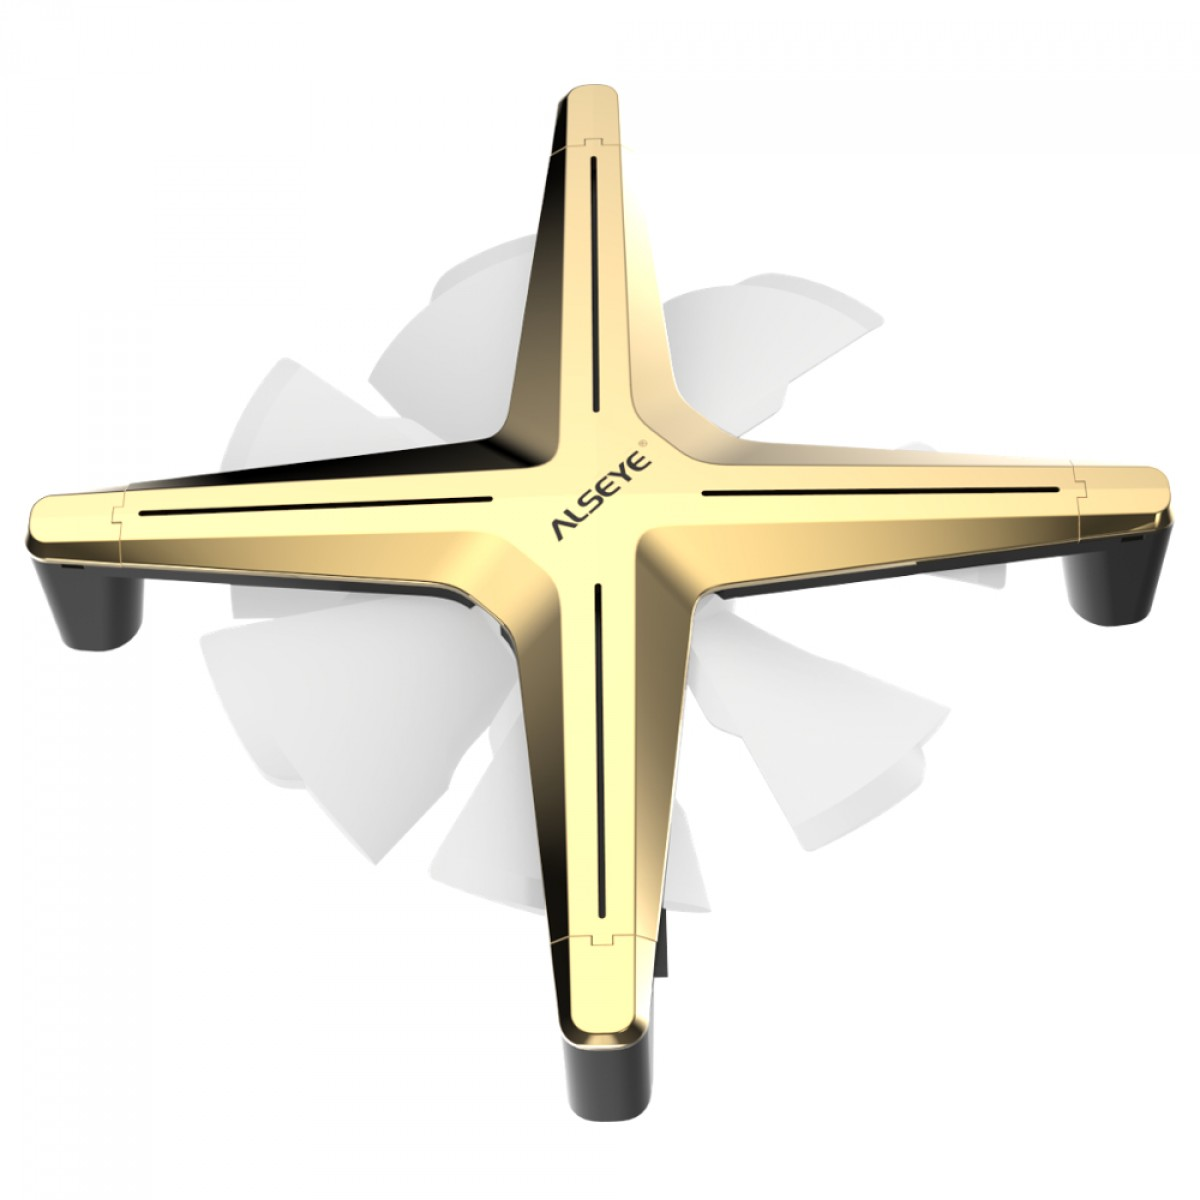 Kit Fan com 3 Unidades Alseye X12, ARGB, Gold, 120mm